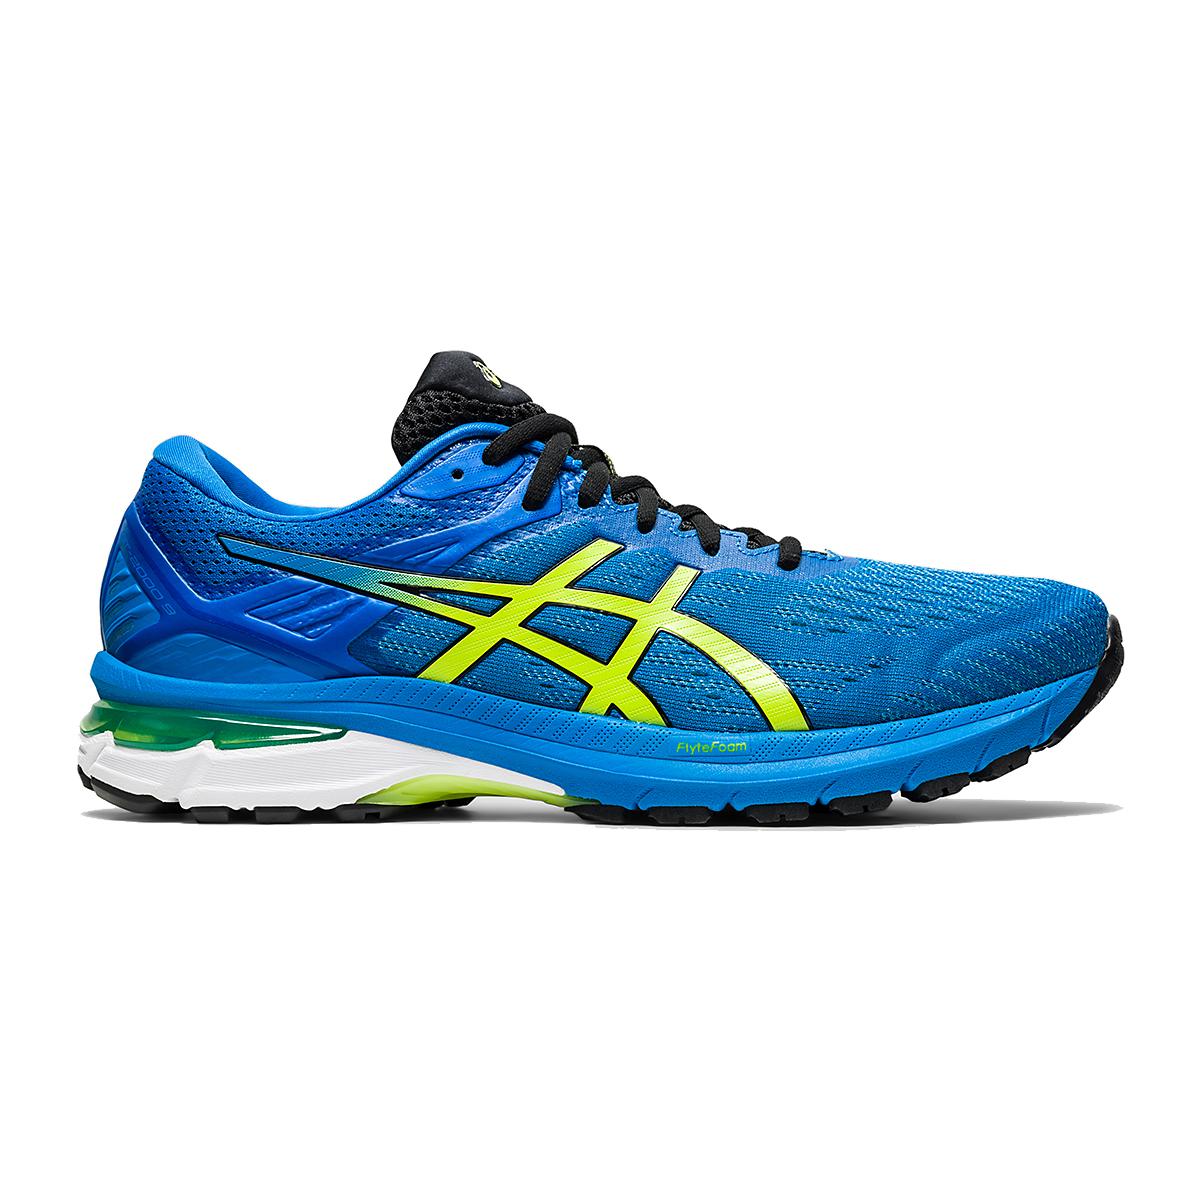 Men's Asics Gt-2000 9 Running Shoe - Color: Directoire Blue - Size: 7 - Width: Regular, Directoire Blue, large, image 1